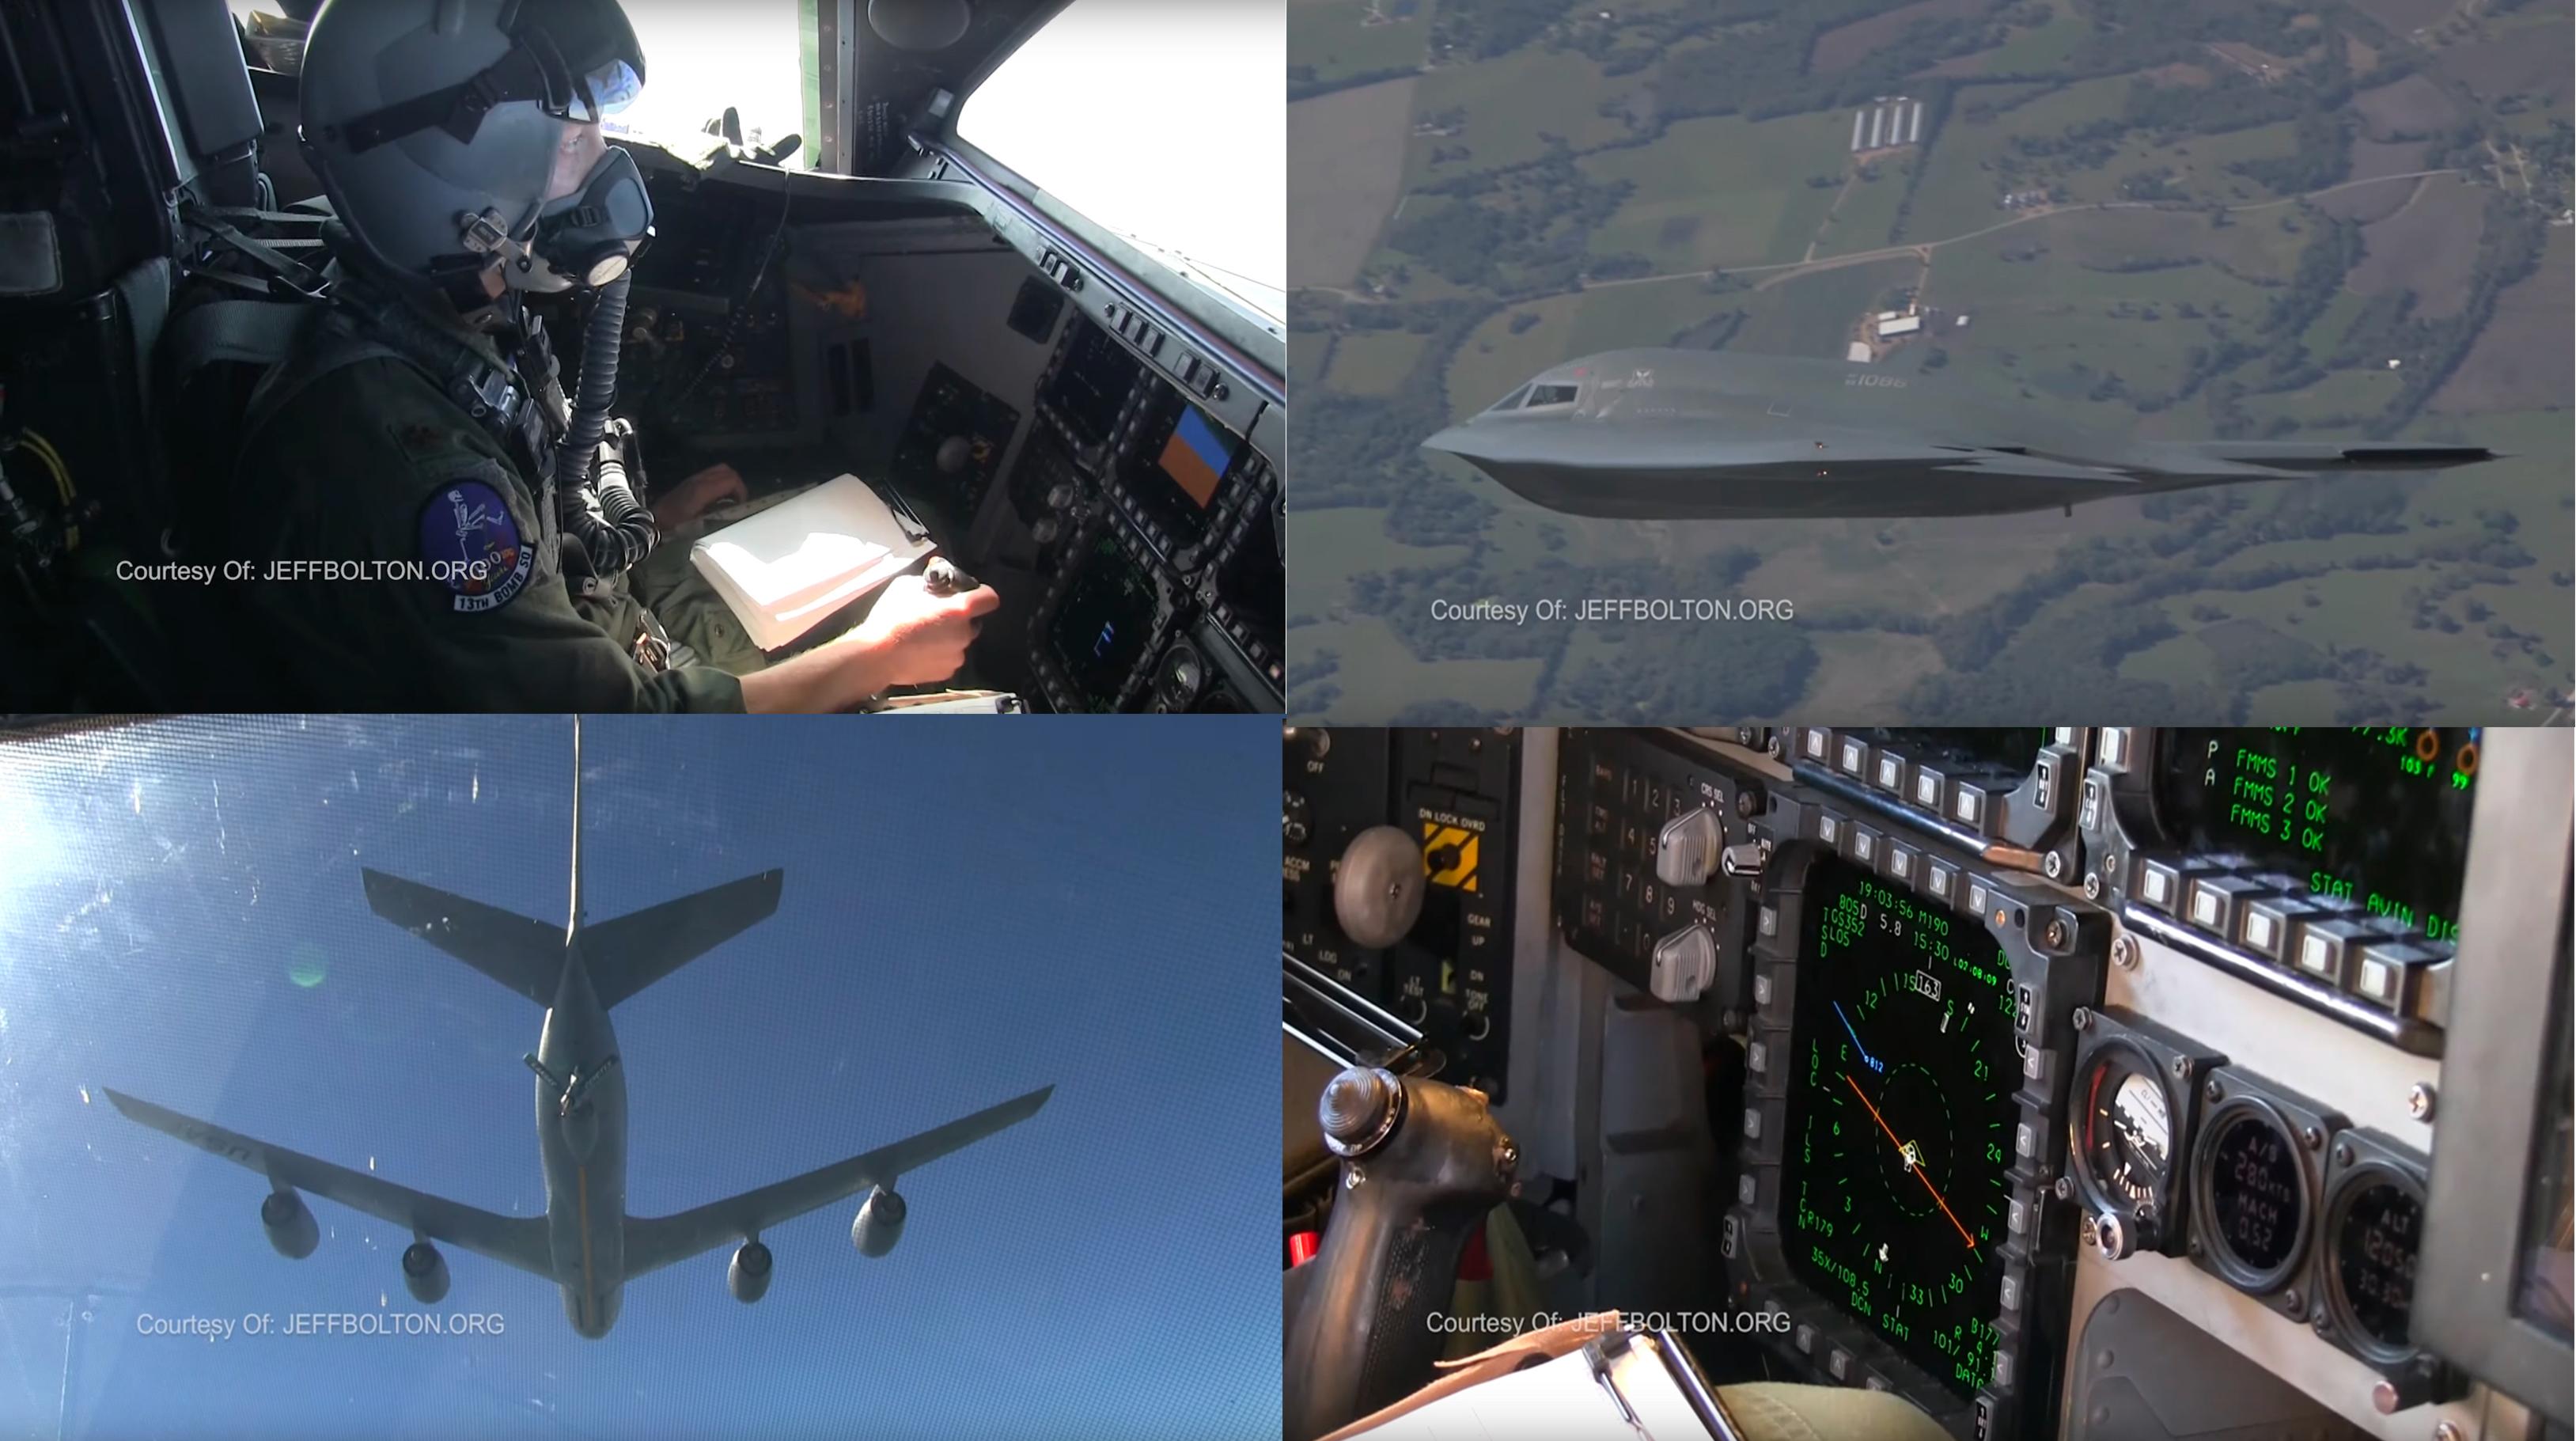 inside air force 1 plane cockpit